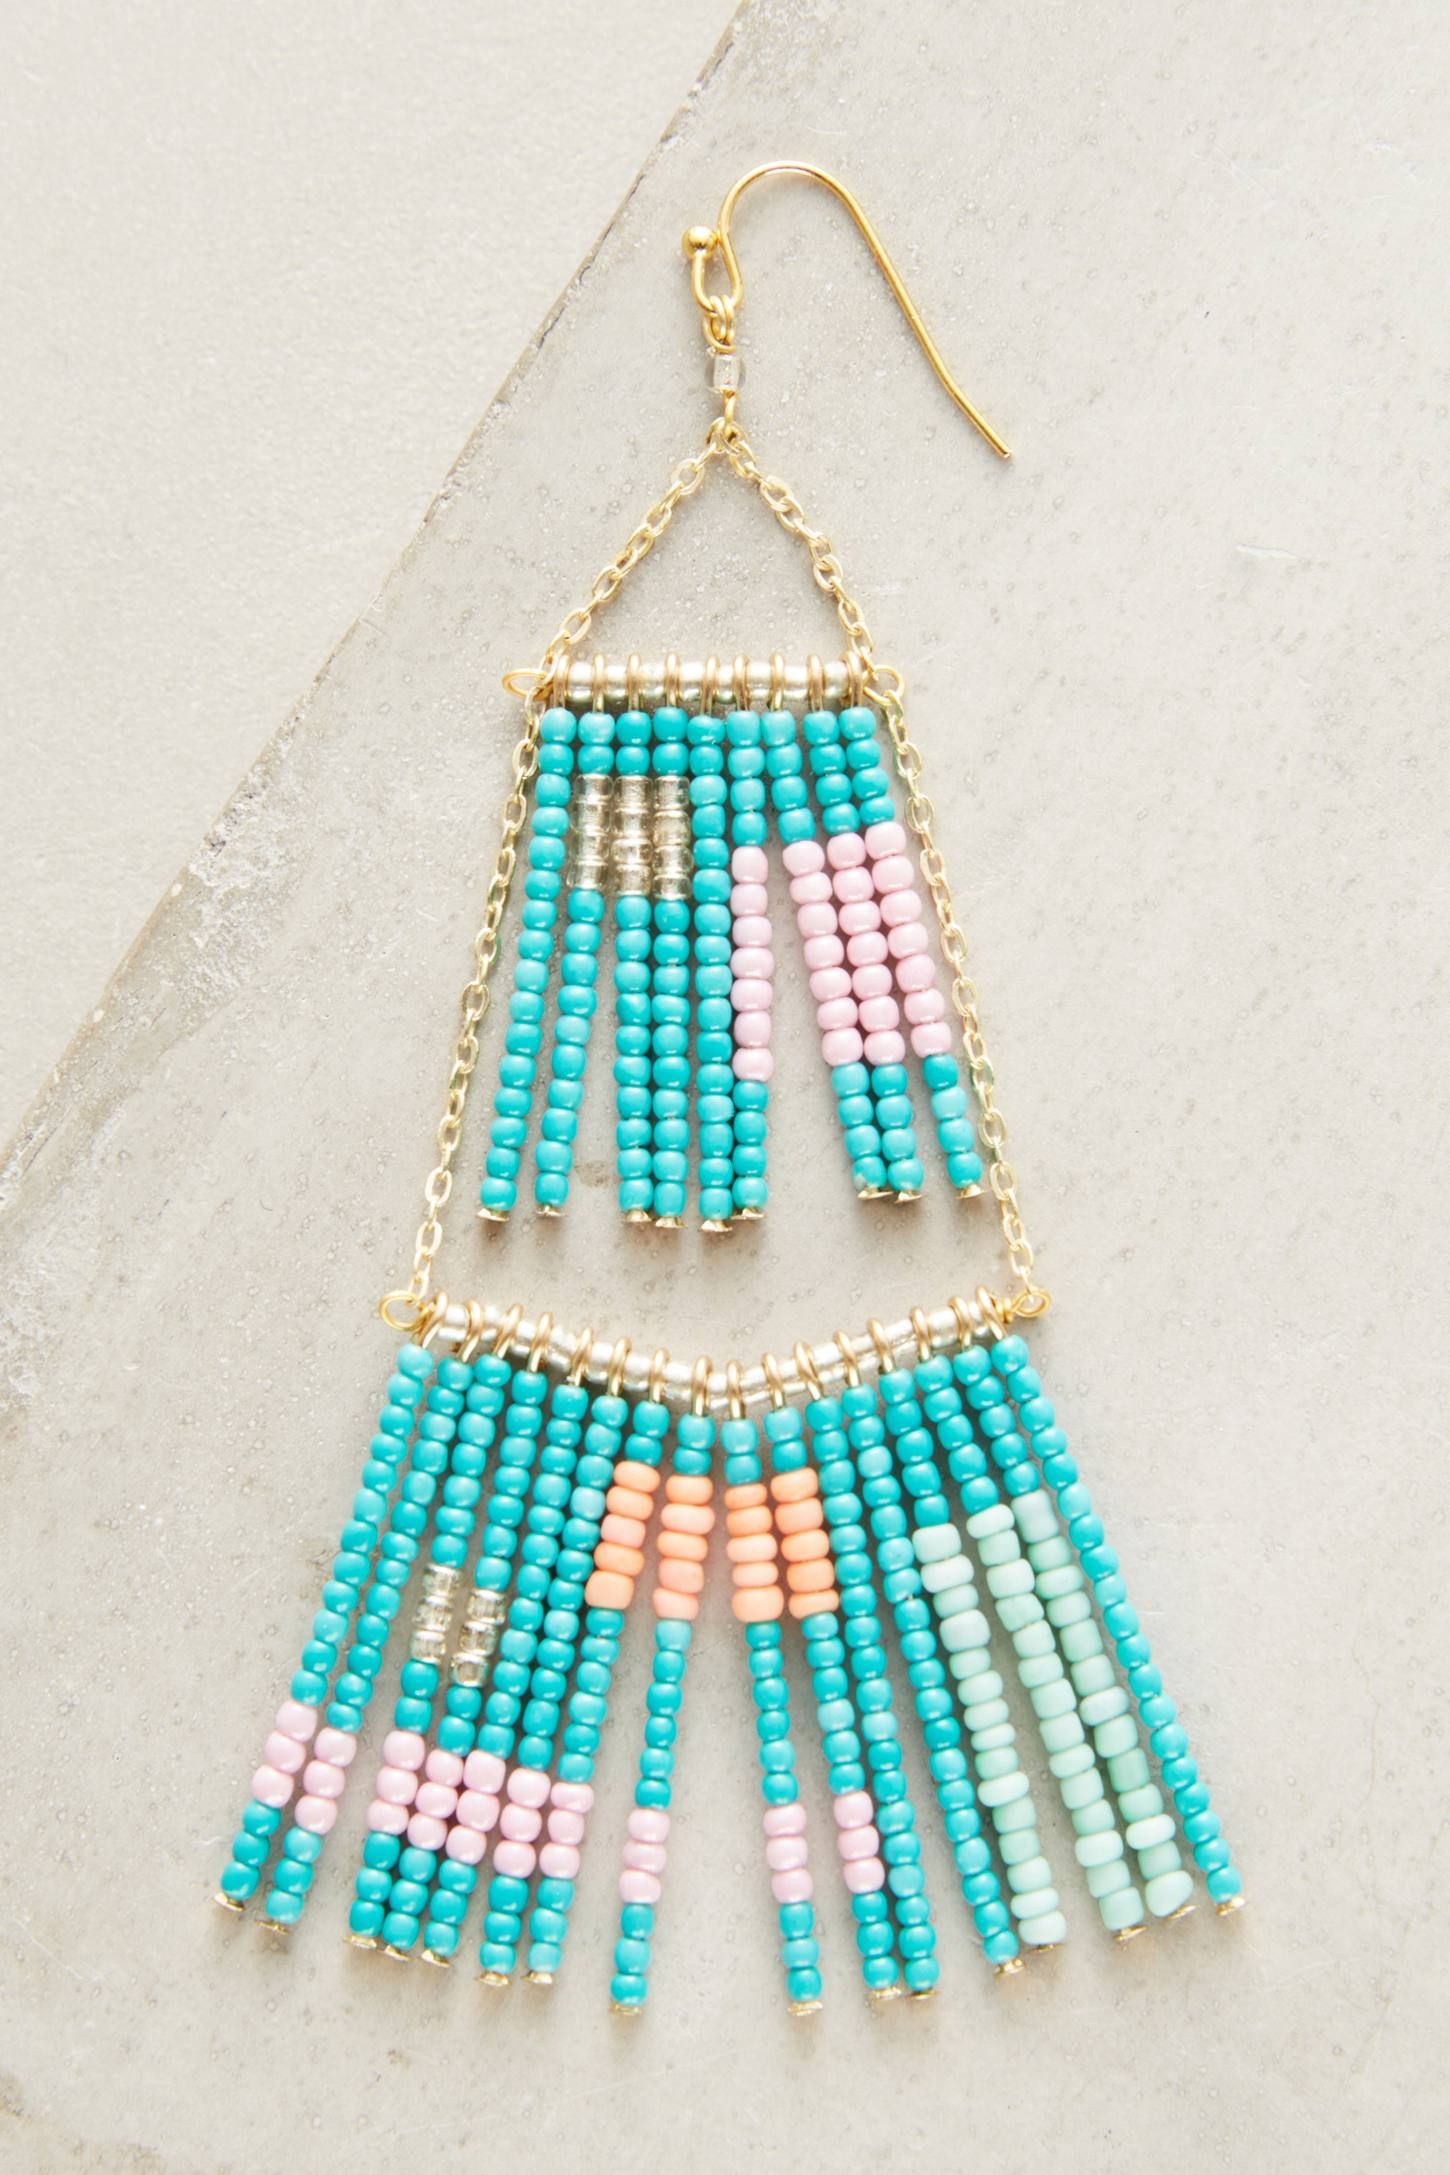 Lake Erie Chandelier Earrings | Lake erie, Chandelier earrings and Beads